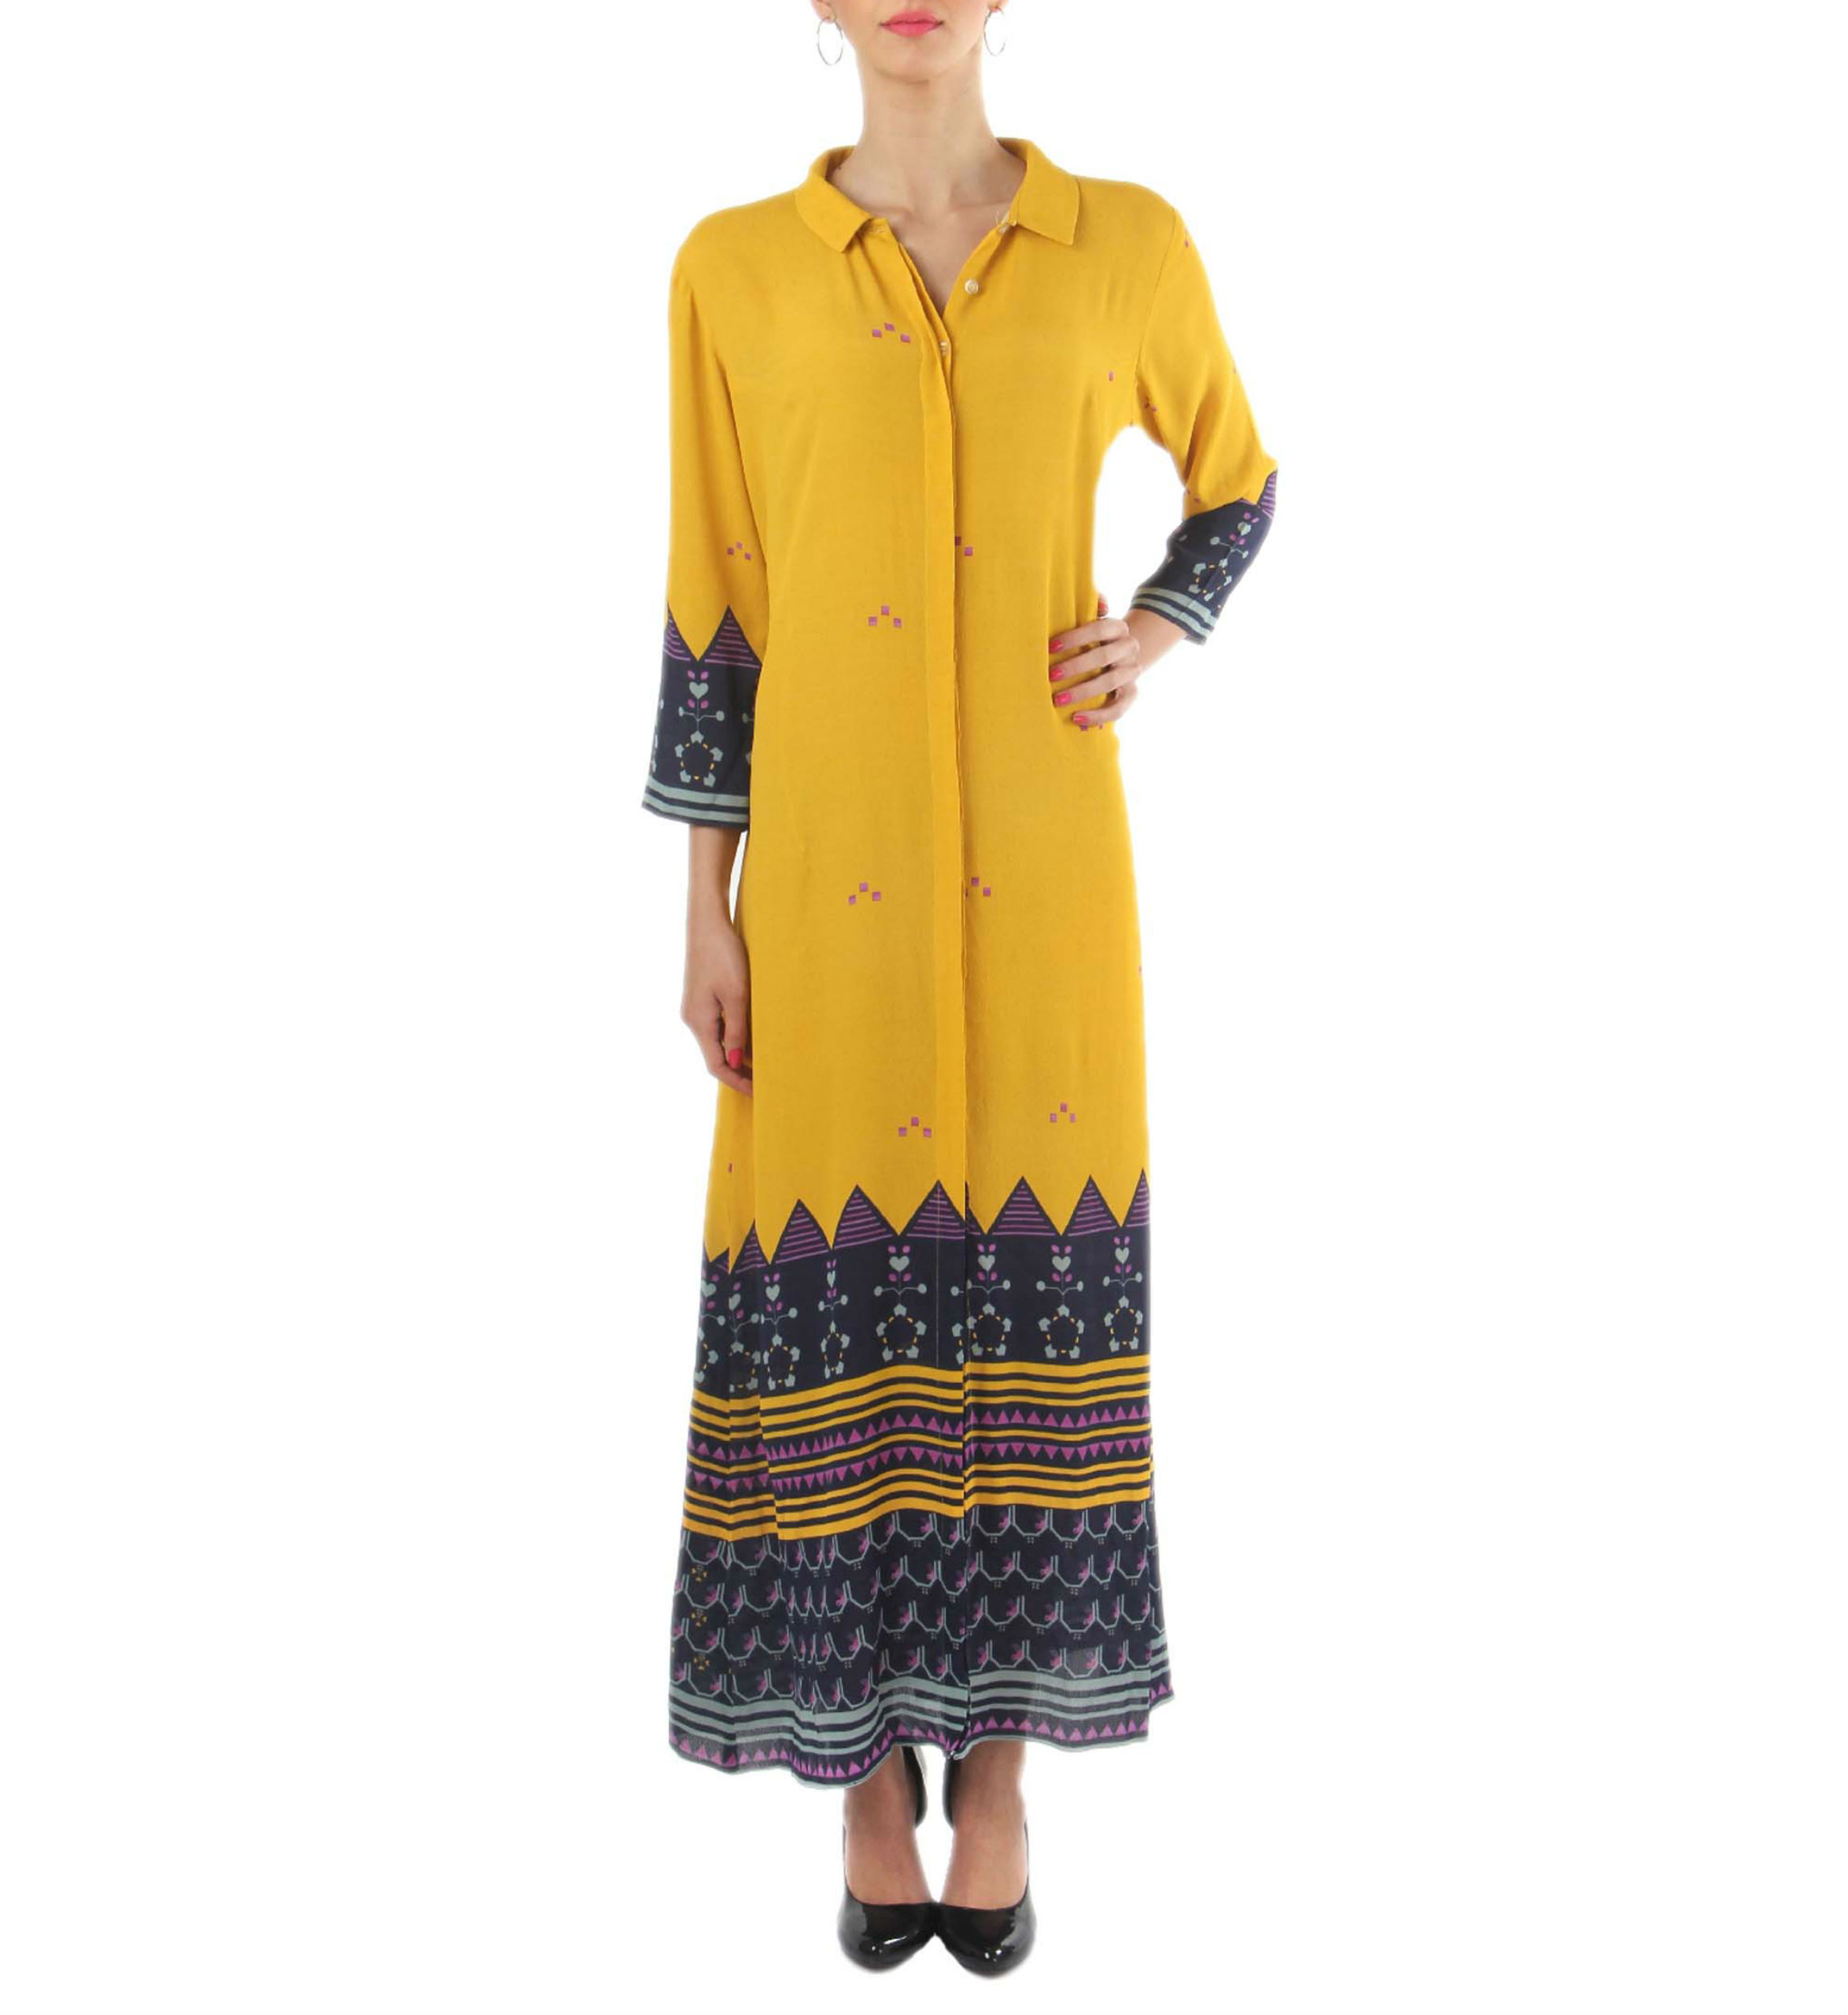 Chrome yellow long dress